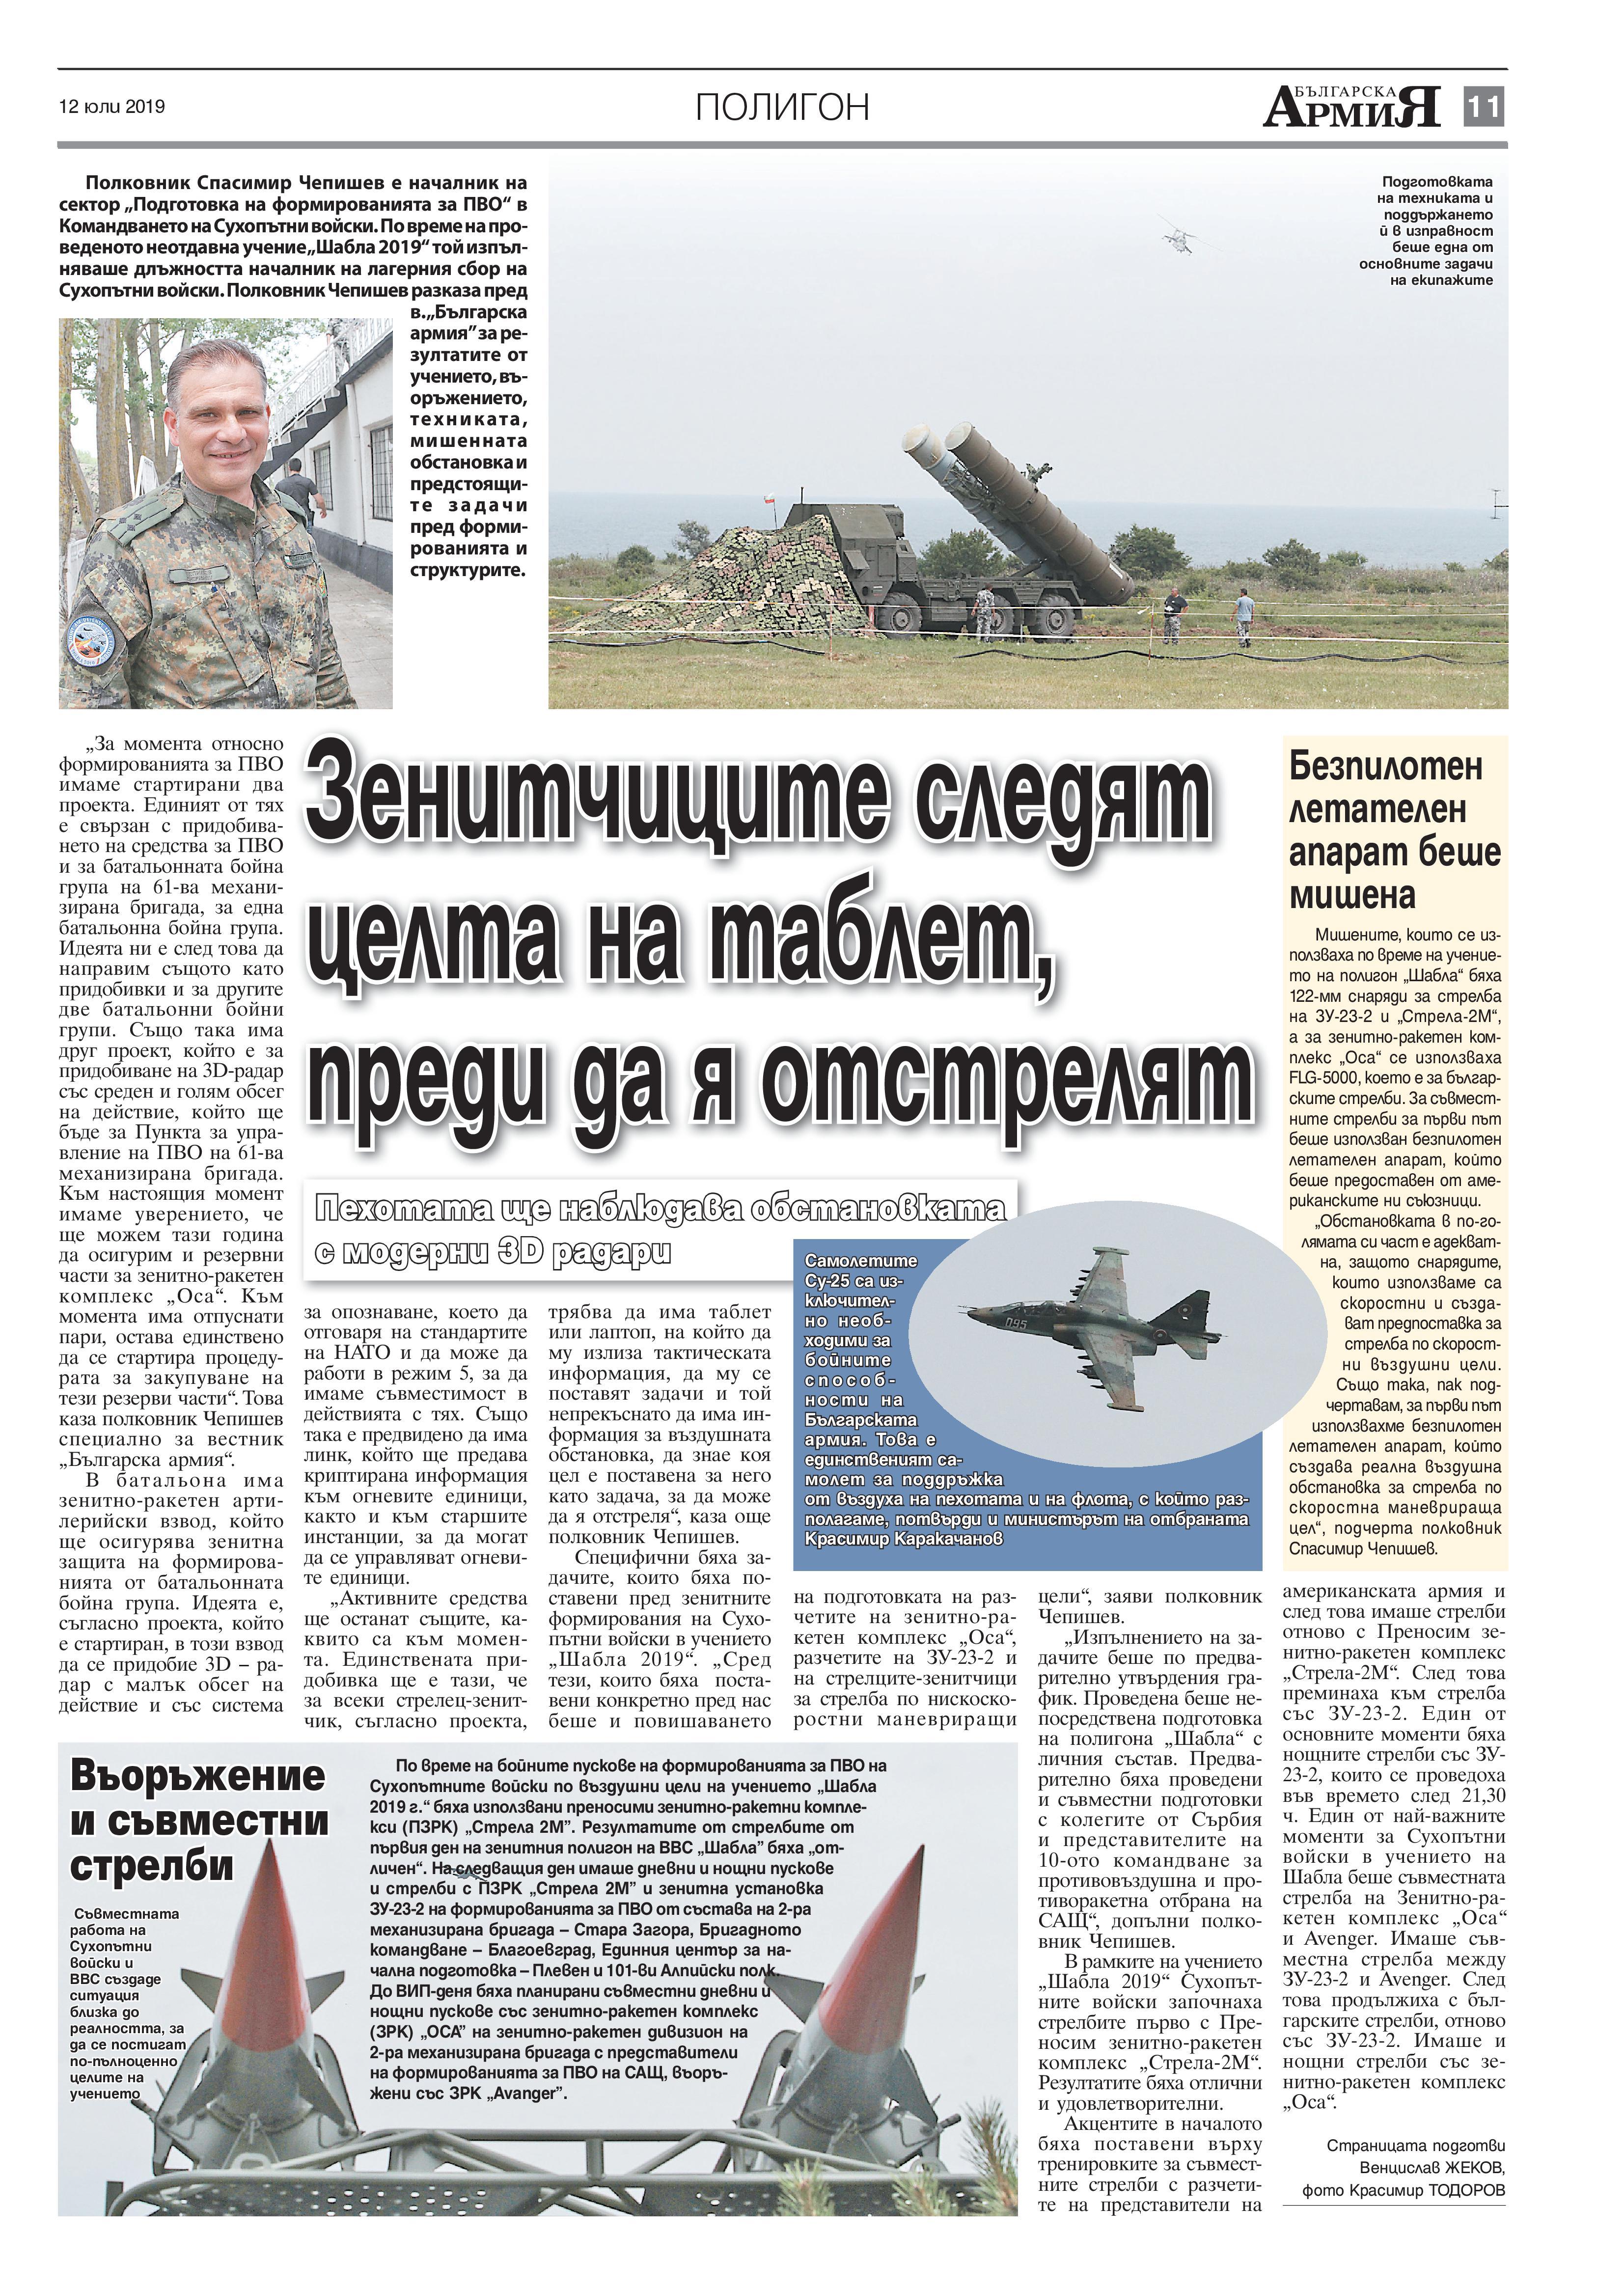 https://www.armymedia.bg/wp-content/uploads/2015/06/11-29.jpg